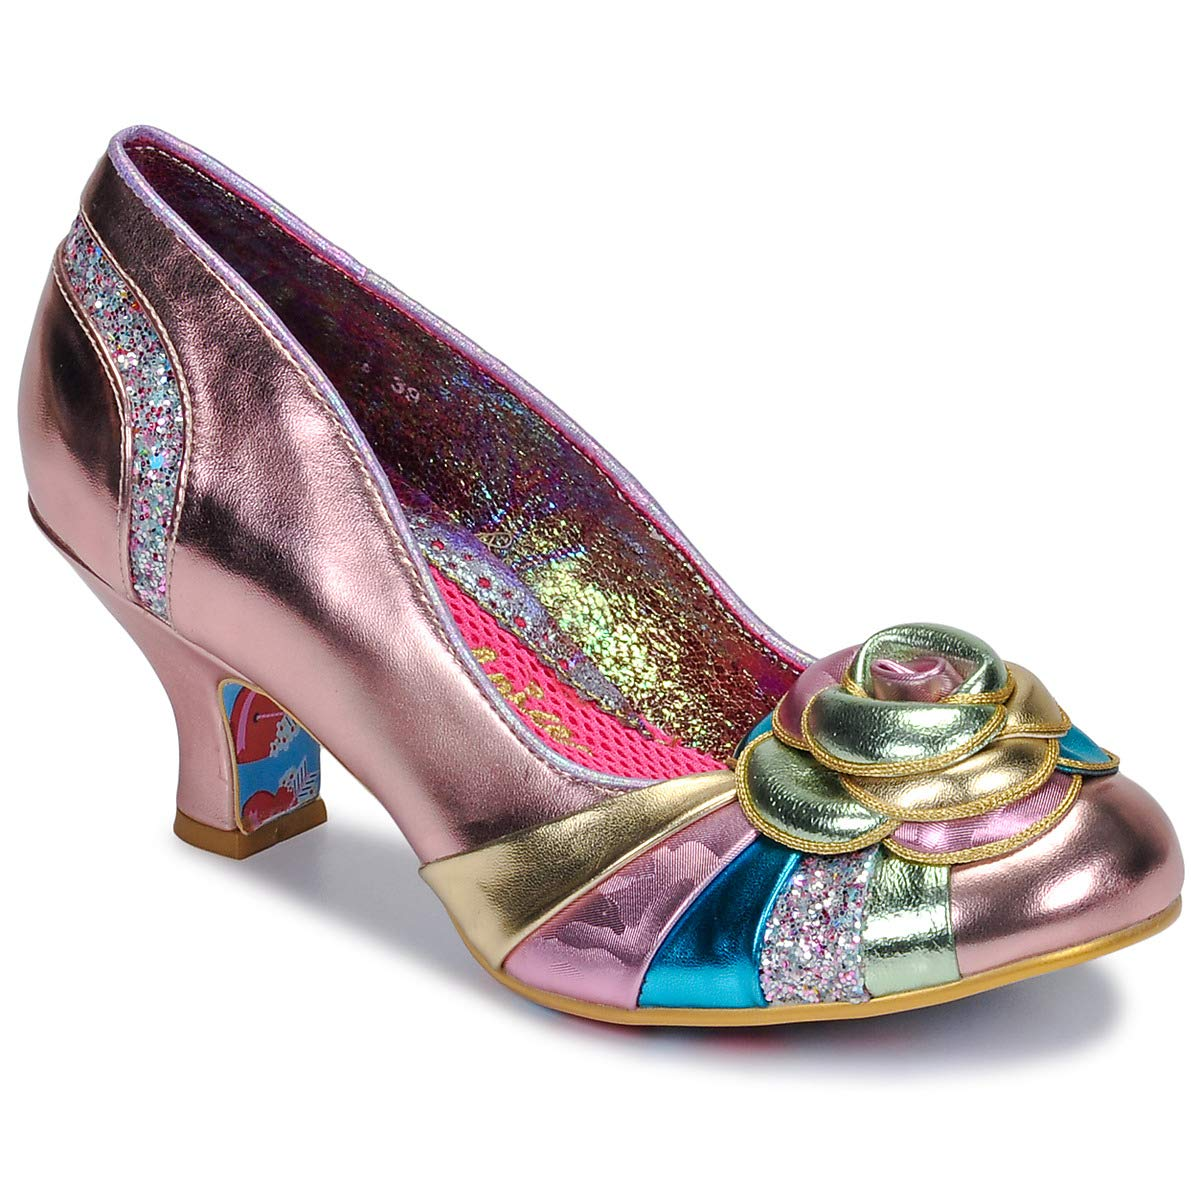 B Kids Girls Black gold ballerina Shoes Irregular Choice Spinning Top